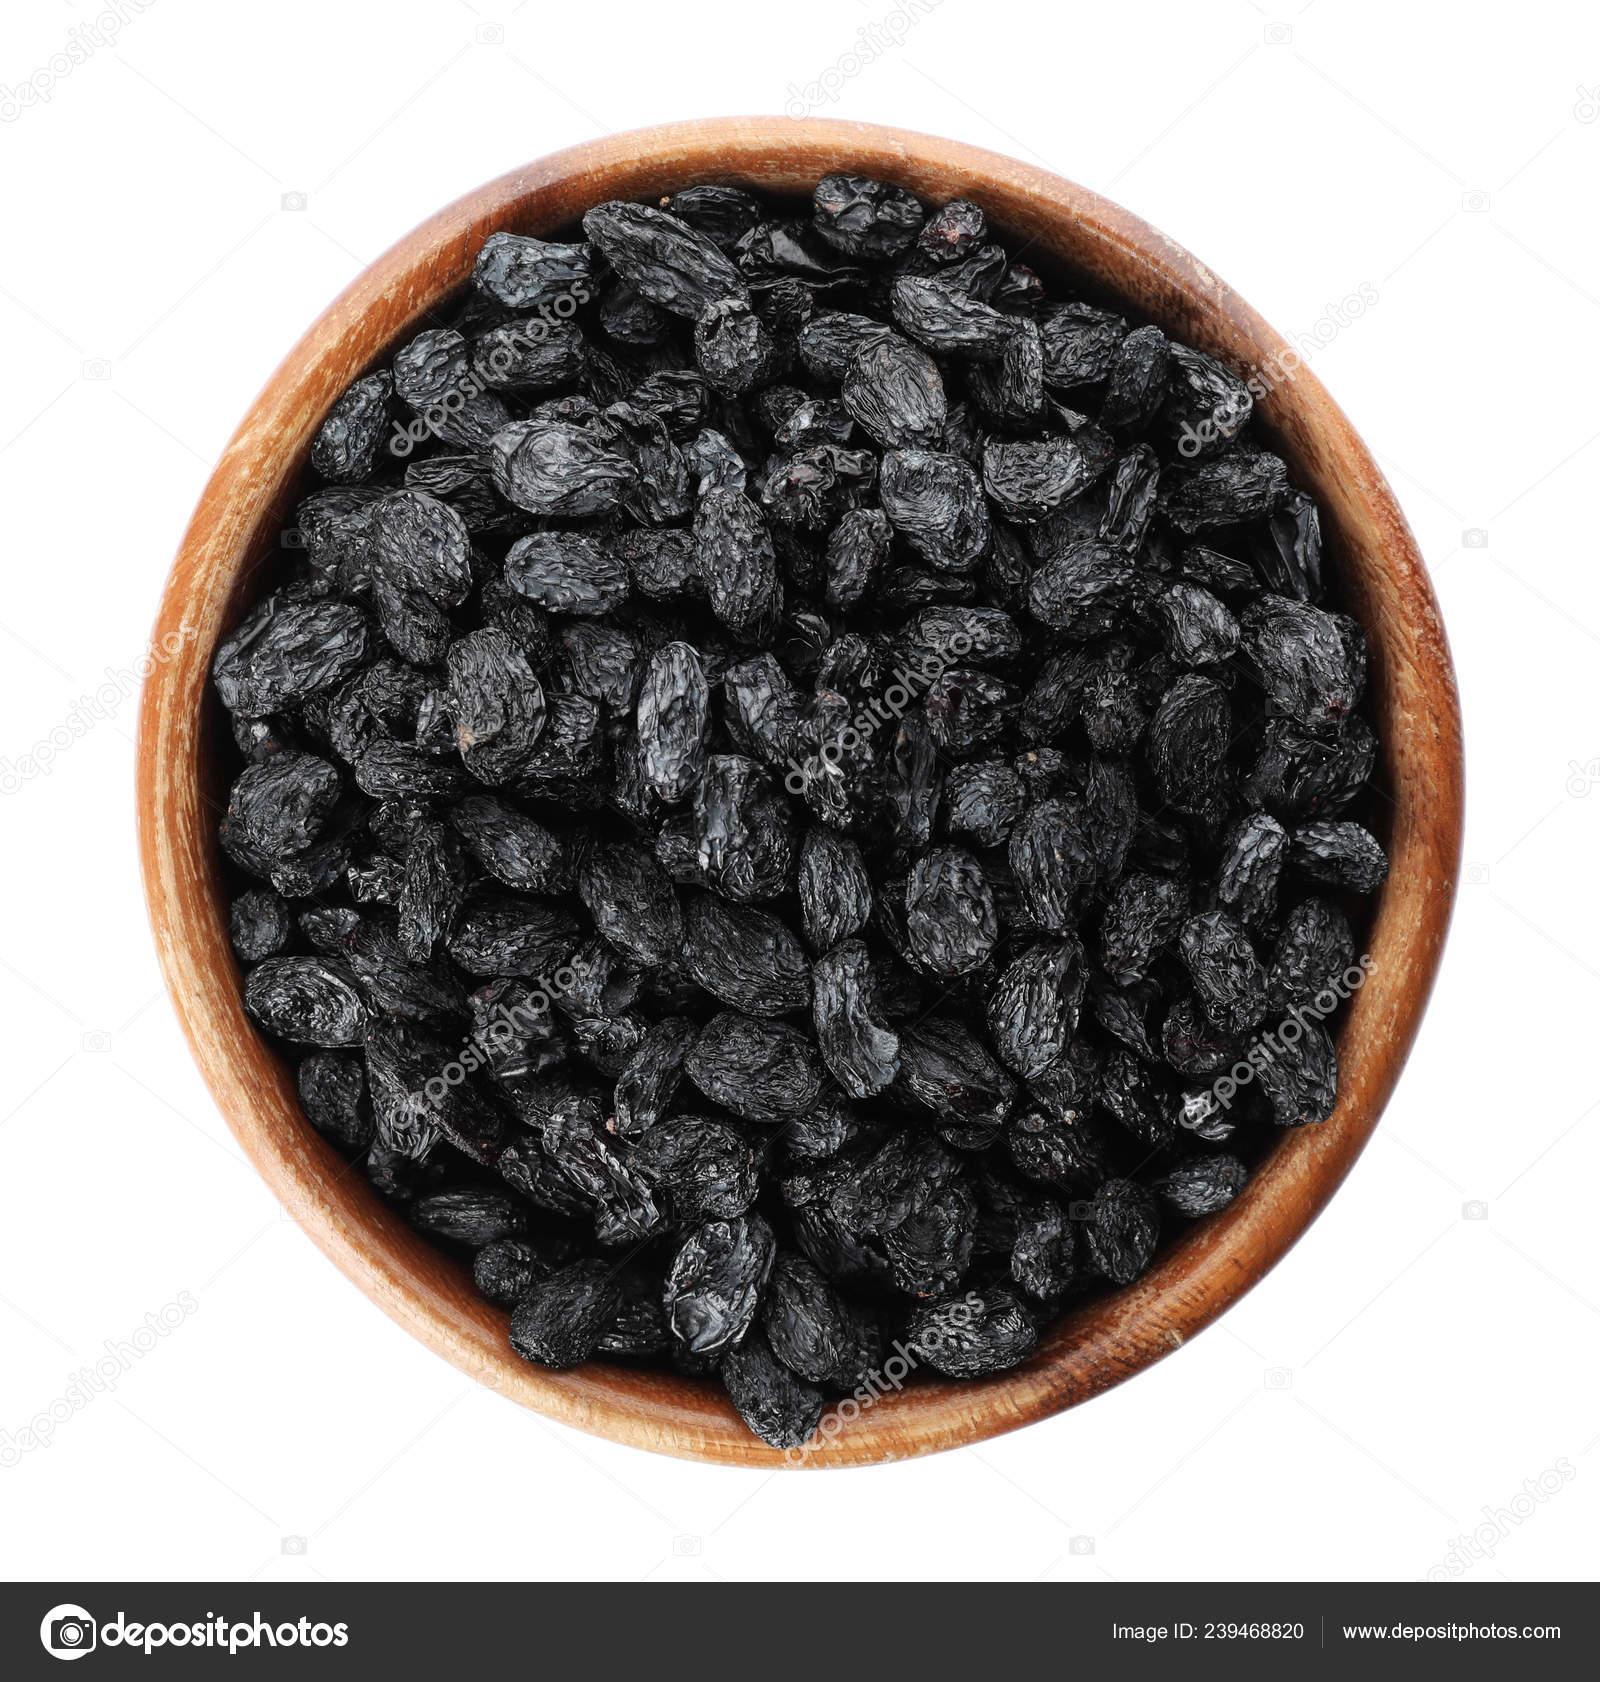 Bowl Dried Dark Raisins Isolated White Top View Healthy Nutrition Stock Photo C Liudmilachernetska Gmail Com 239468820